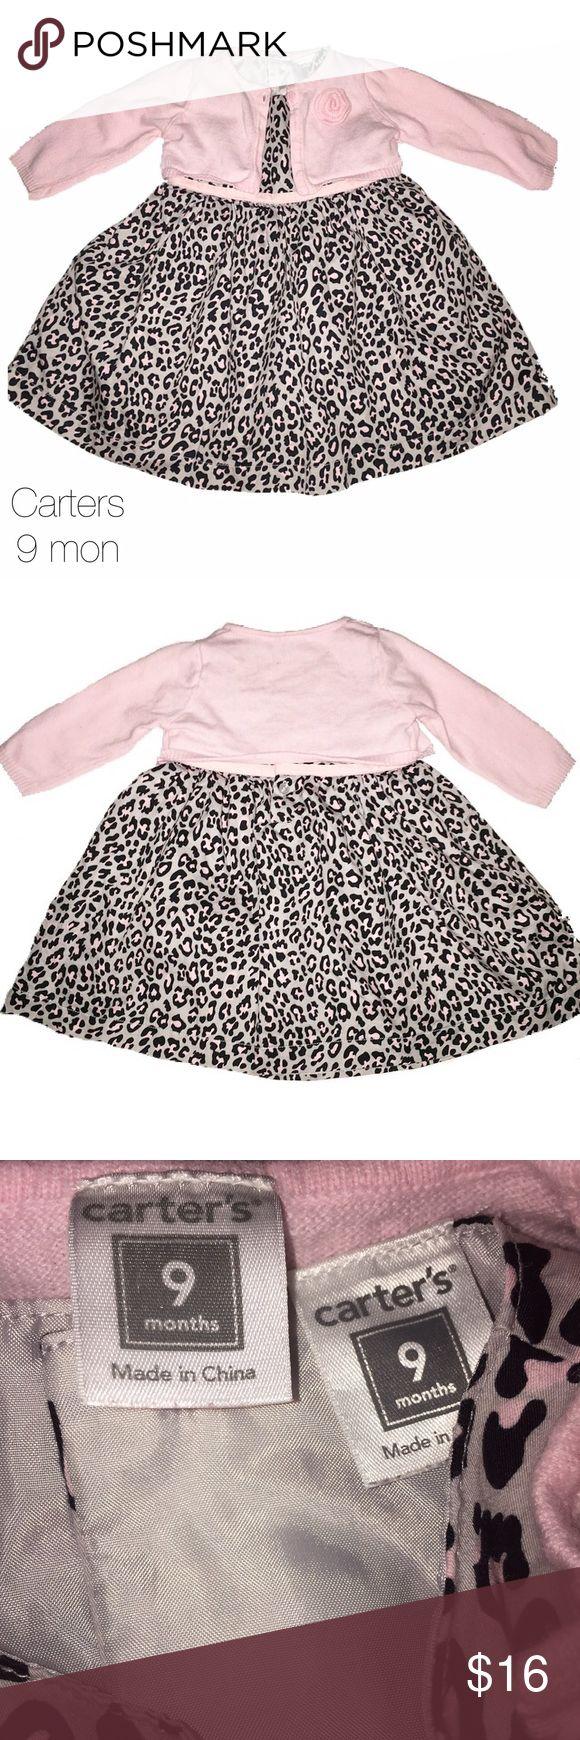 Carters Gray Light Pink Cardigan Dress Set 9 mon Gently worn Carters Gray Light Pink Cardigan Dress Set 9 mon Carter's Dresses